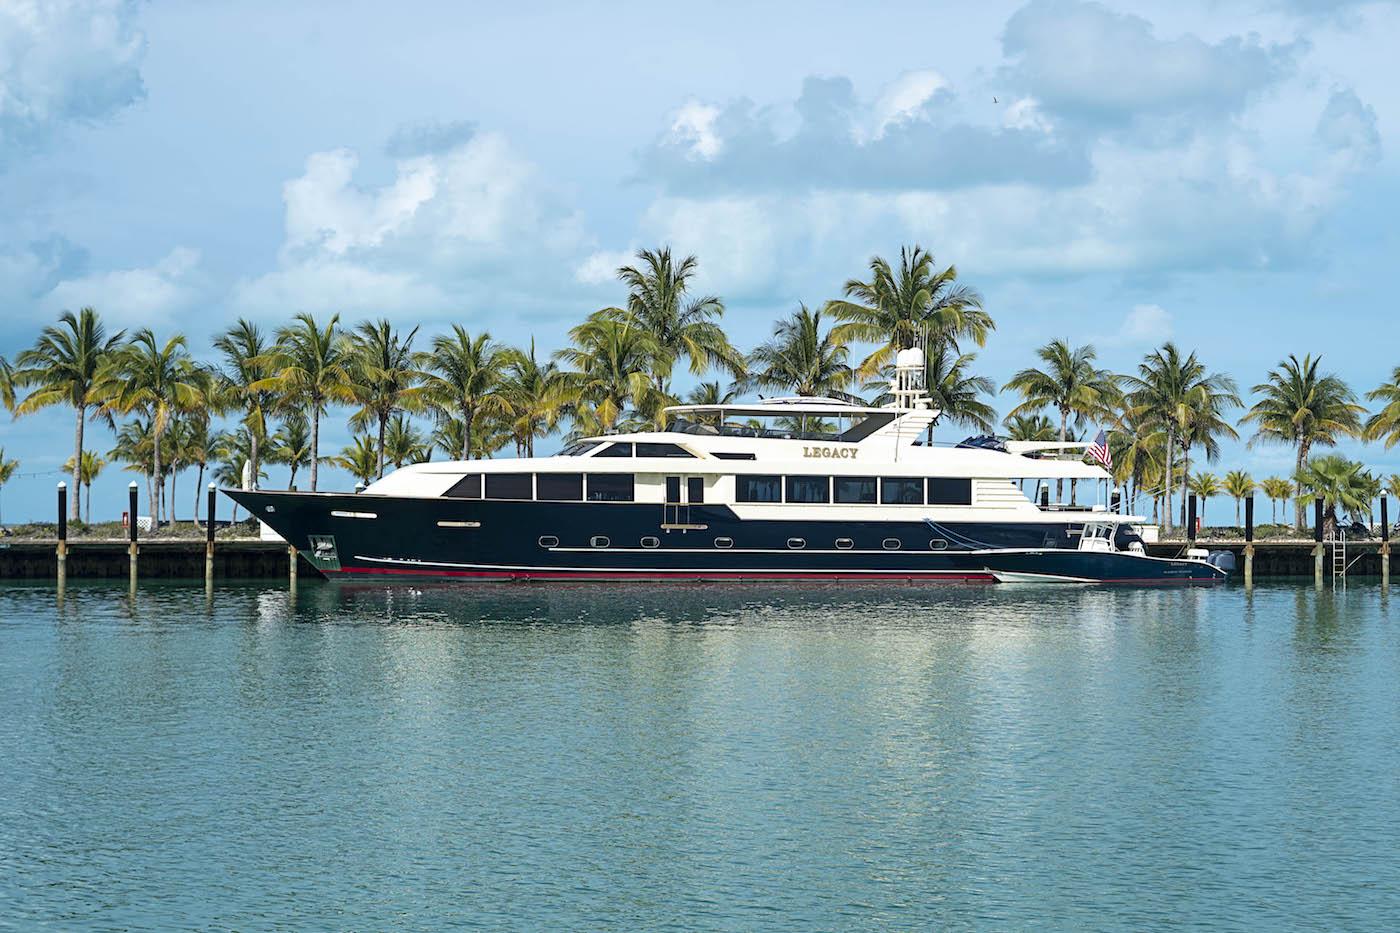 Luxury yacht Legacy